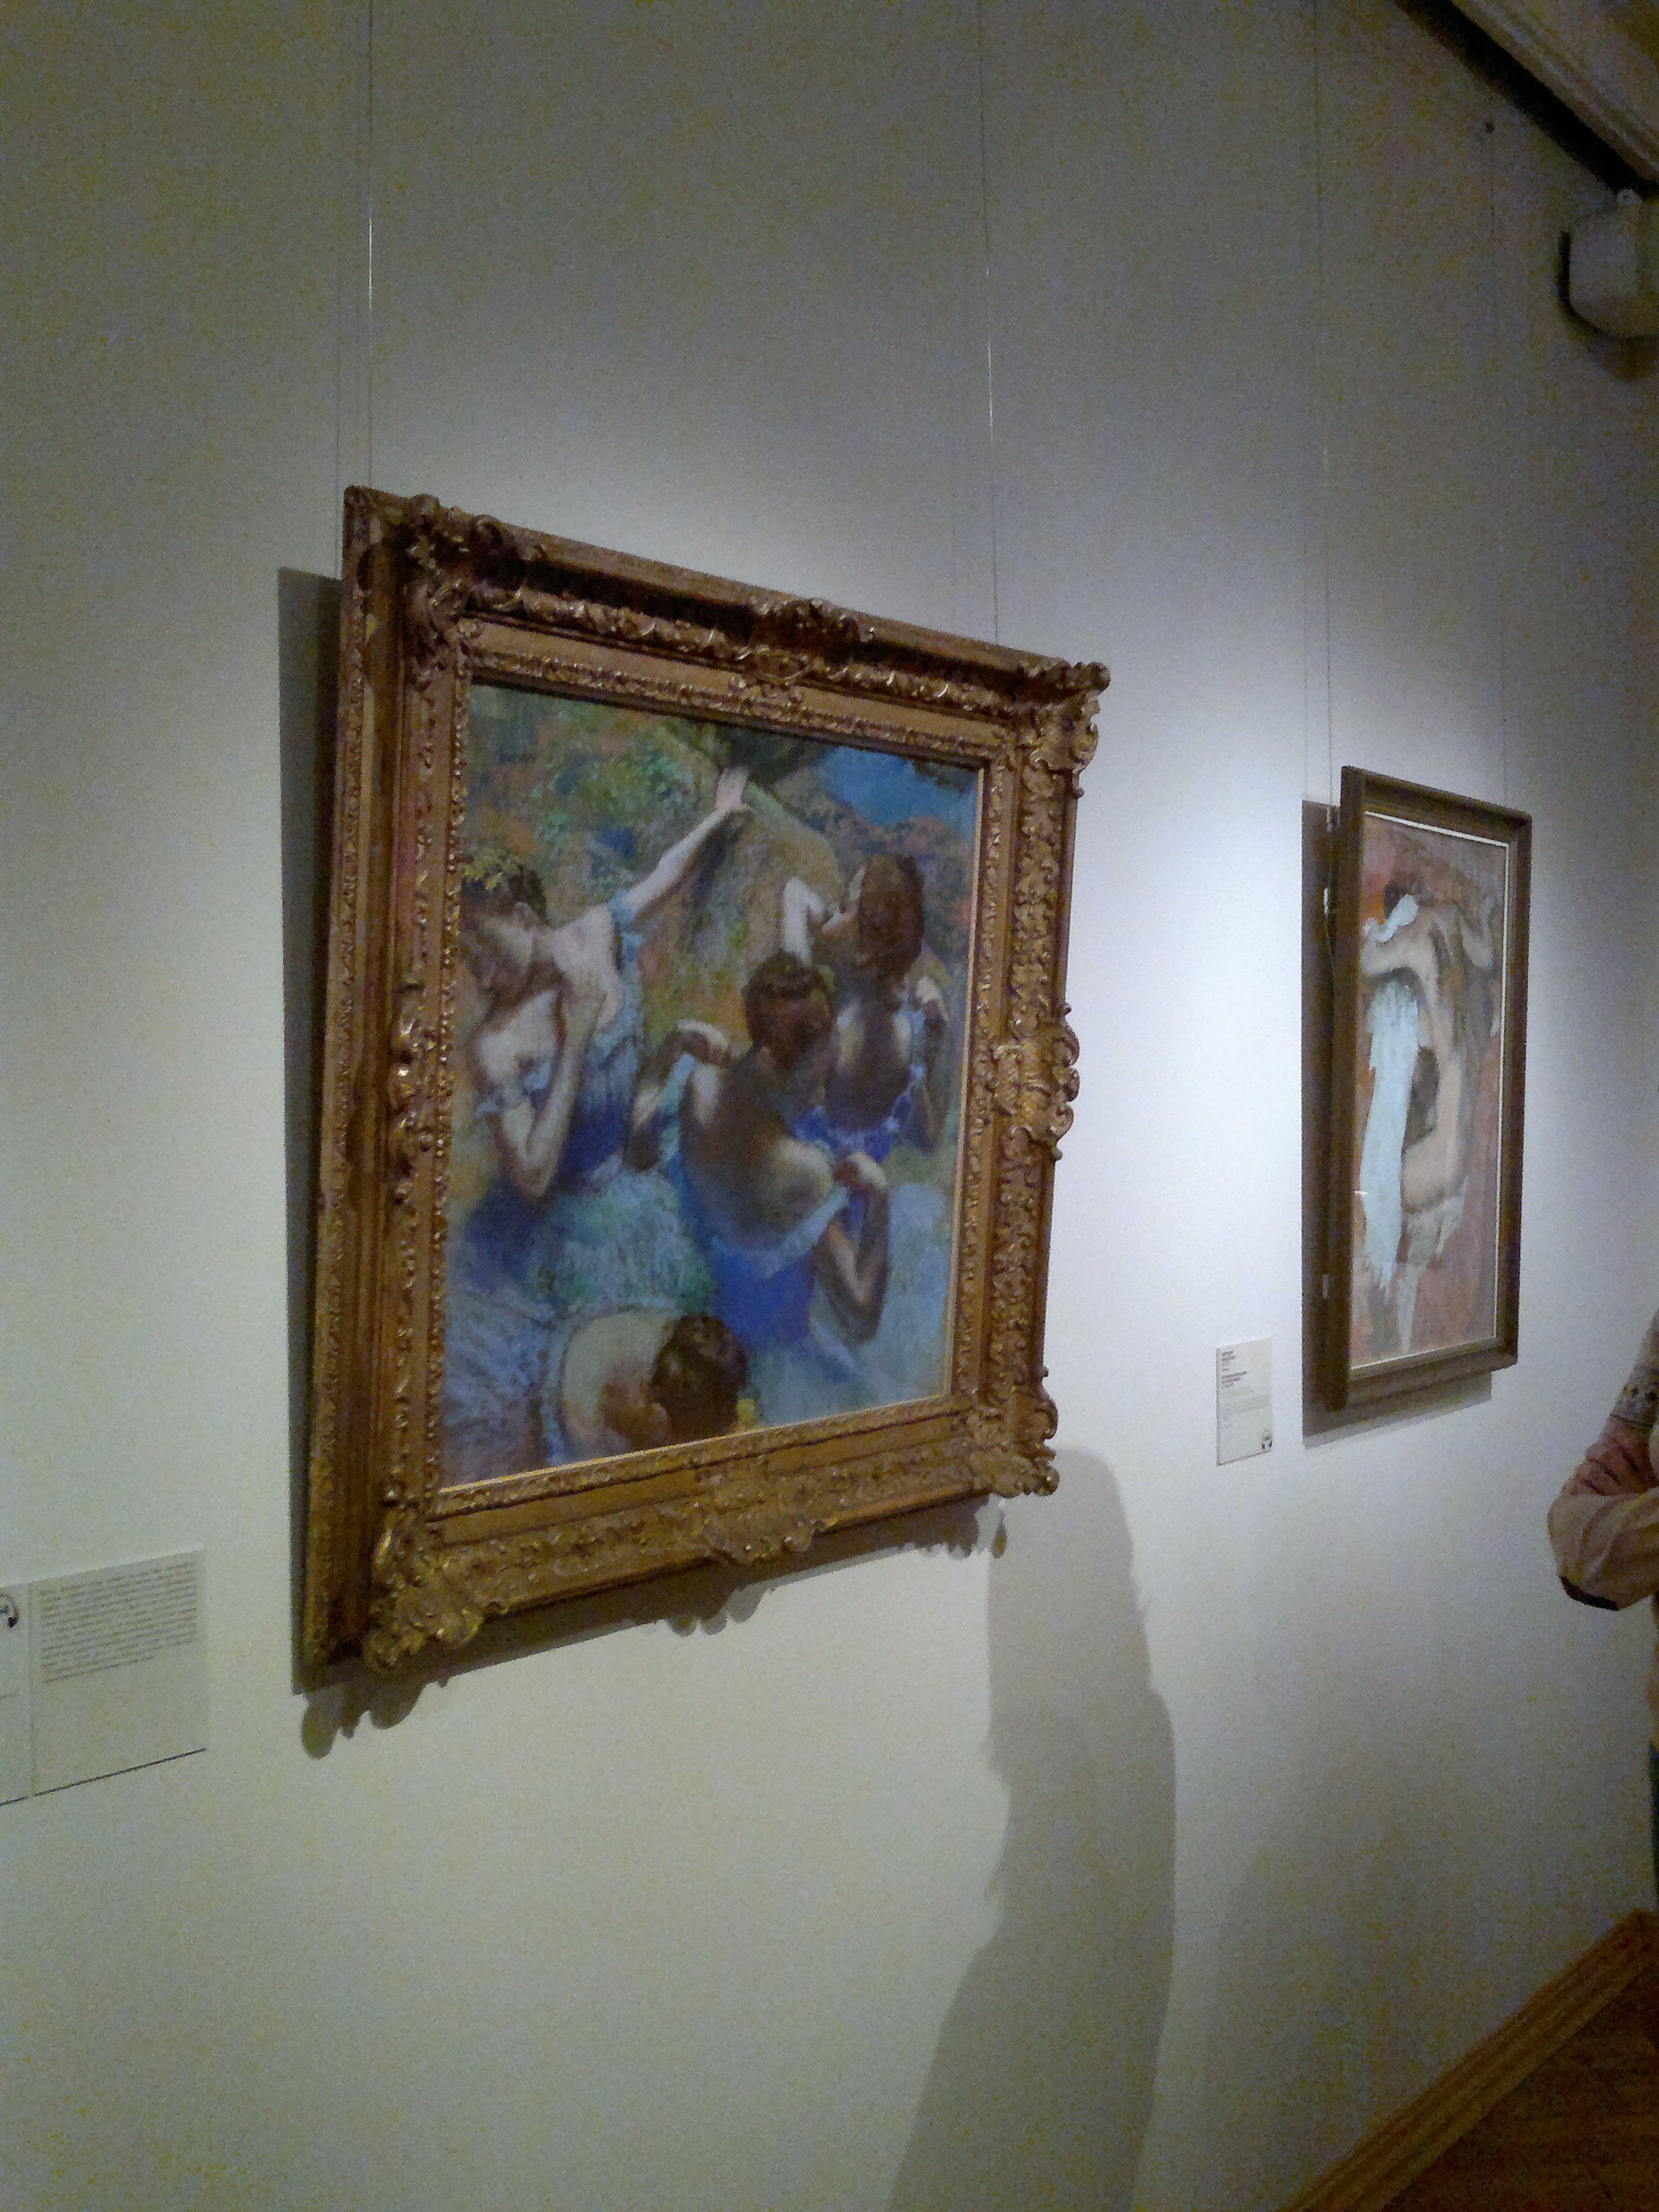 Edgar Degas in The Pushkin State Museum of Fine Arts